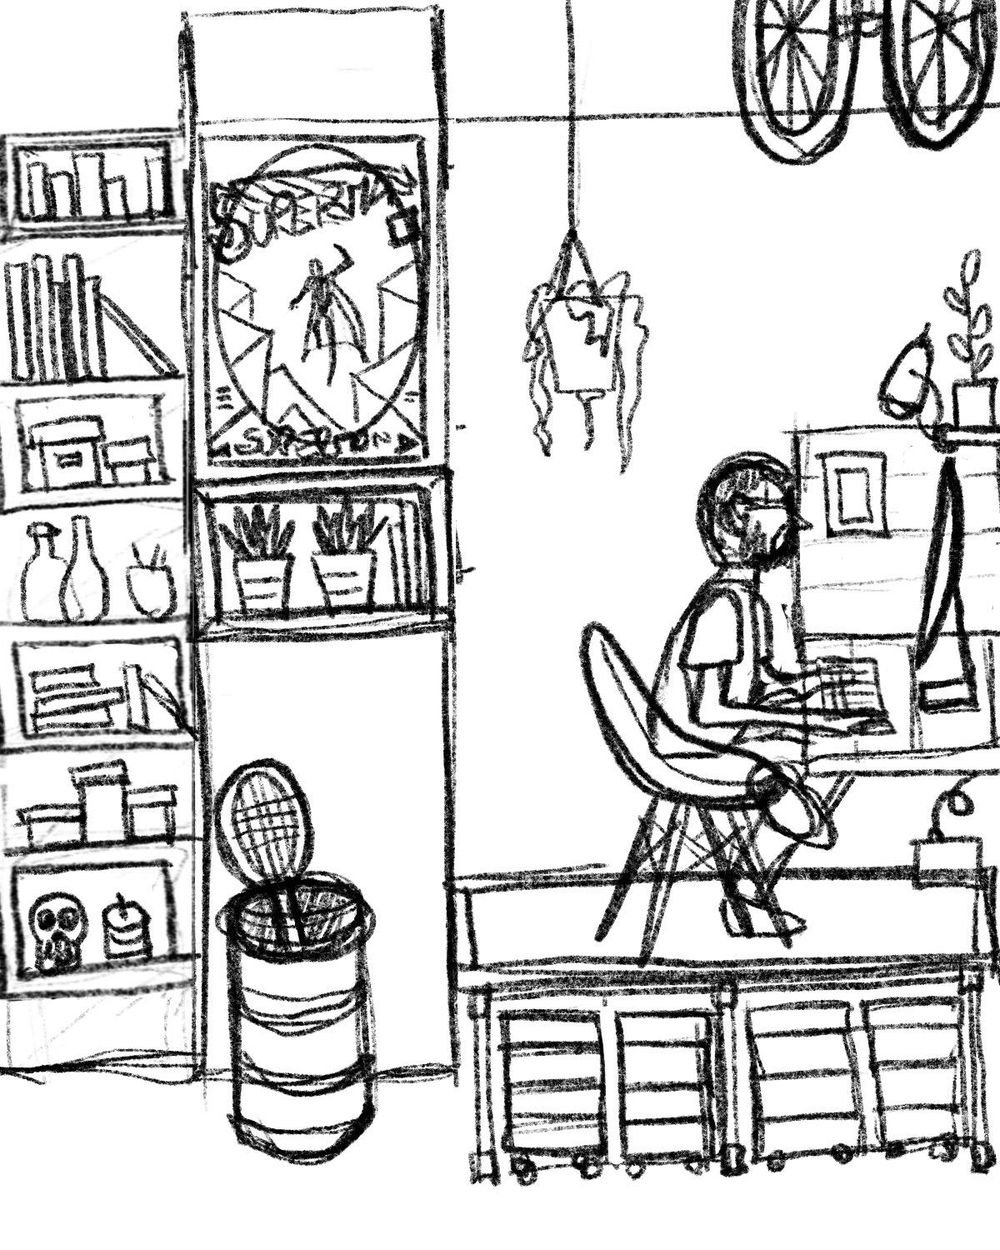 My workspace. Sebasandrade - image 3 - student project